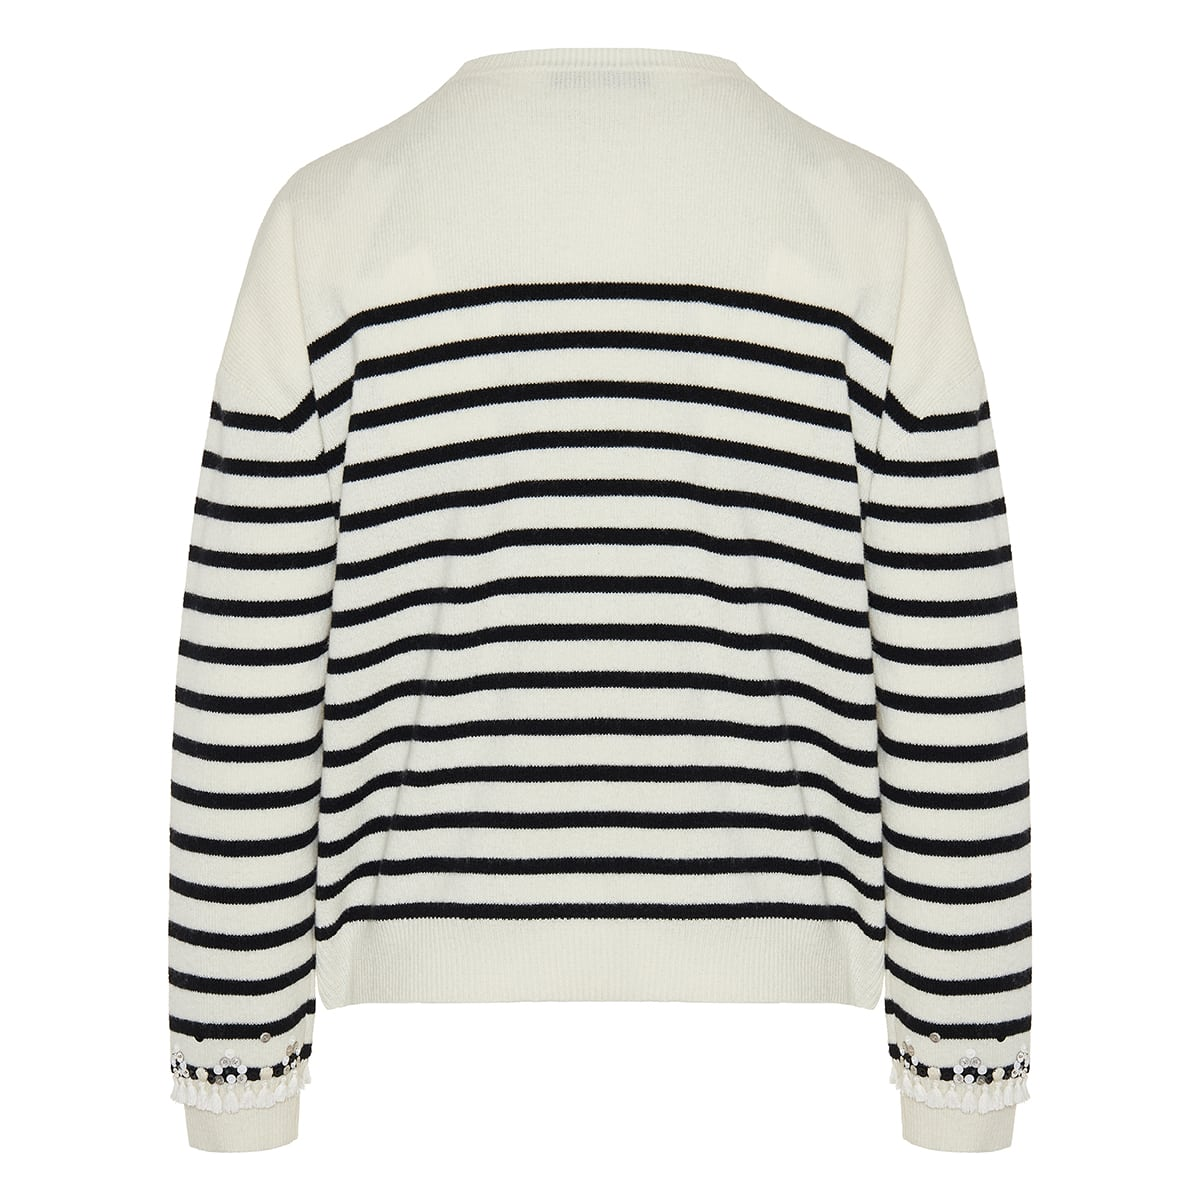 Embellished logo striped sweater